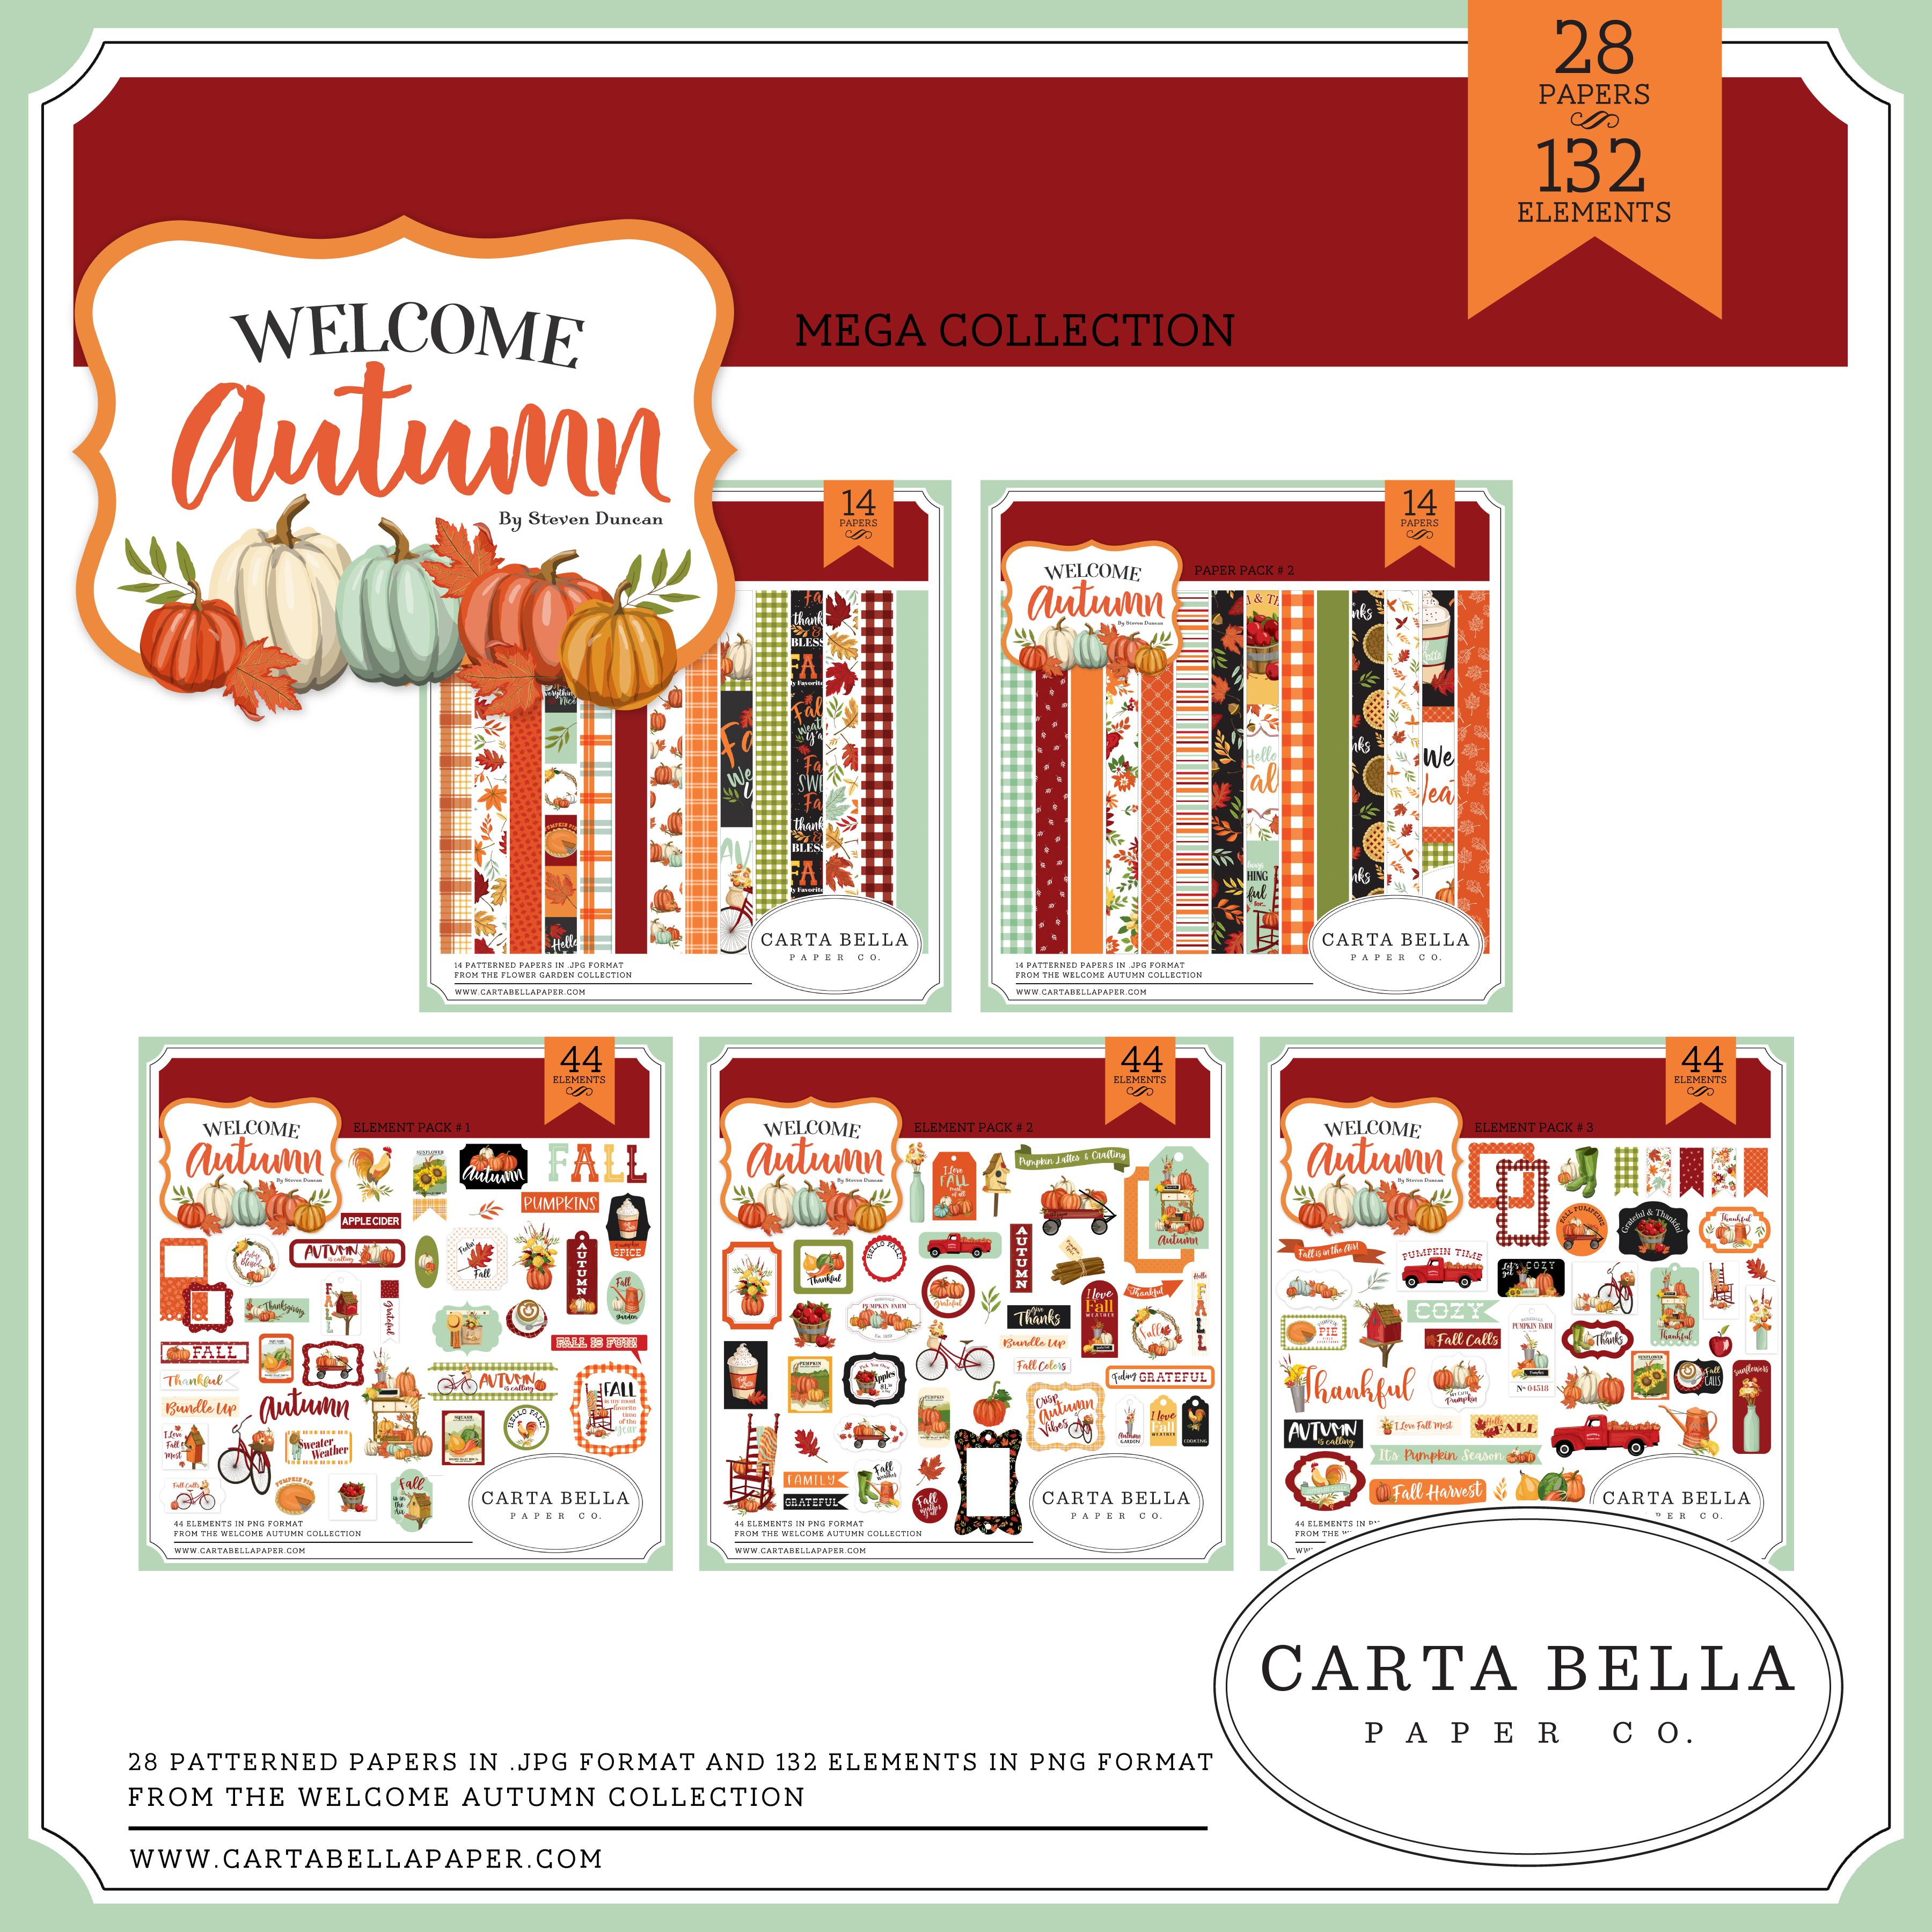 Welcome Autumn Mega Collection